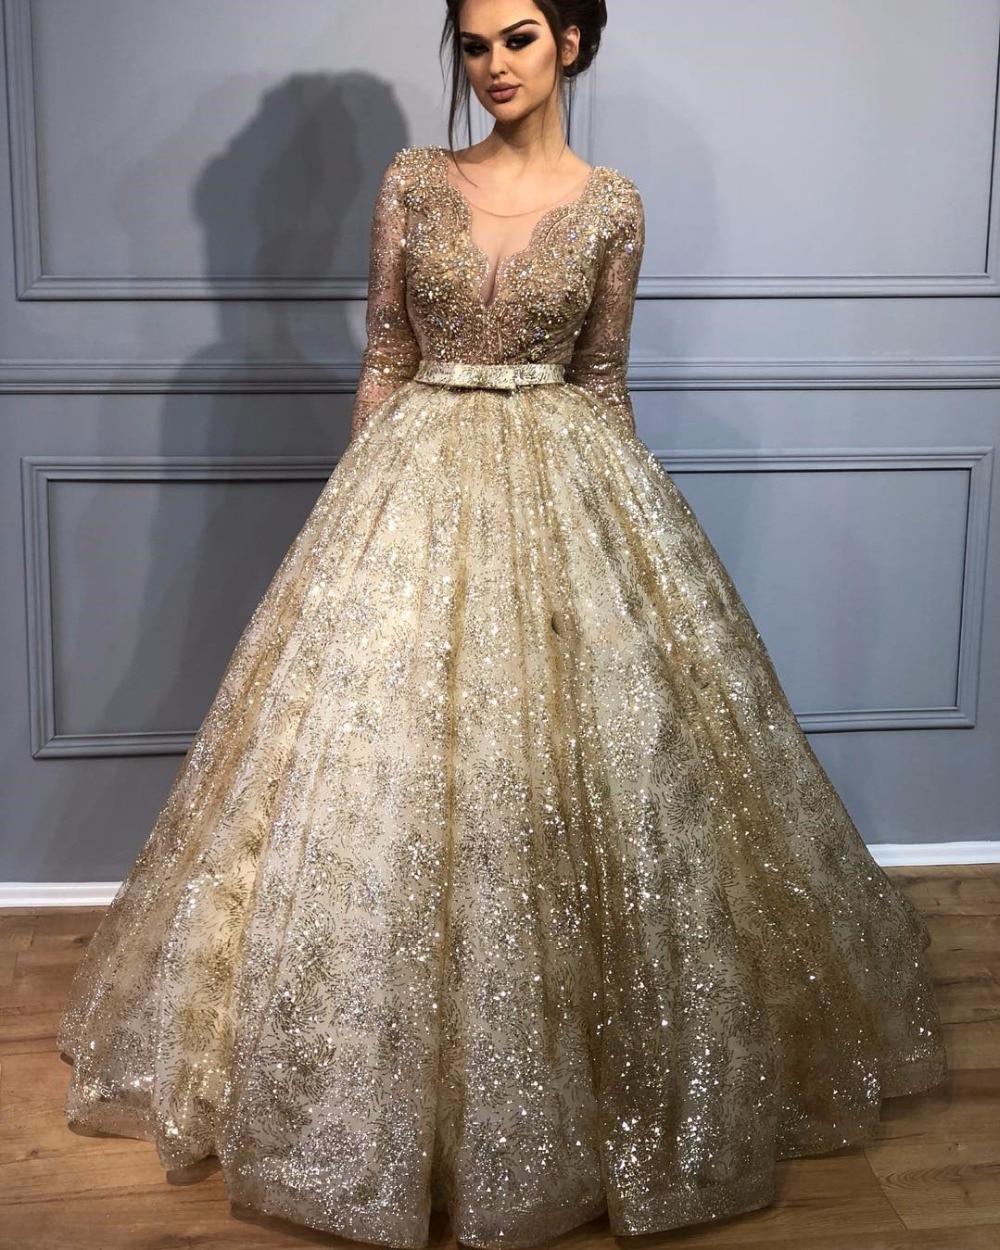 Sheer Ball Gown 2019   Prom     Dresses   Illusion Gold Lace Heavy Beading Evening   Dresses   Long Vestidos De Festa Graduate   Dress